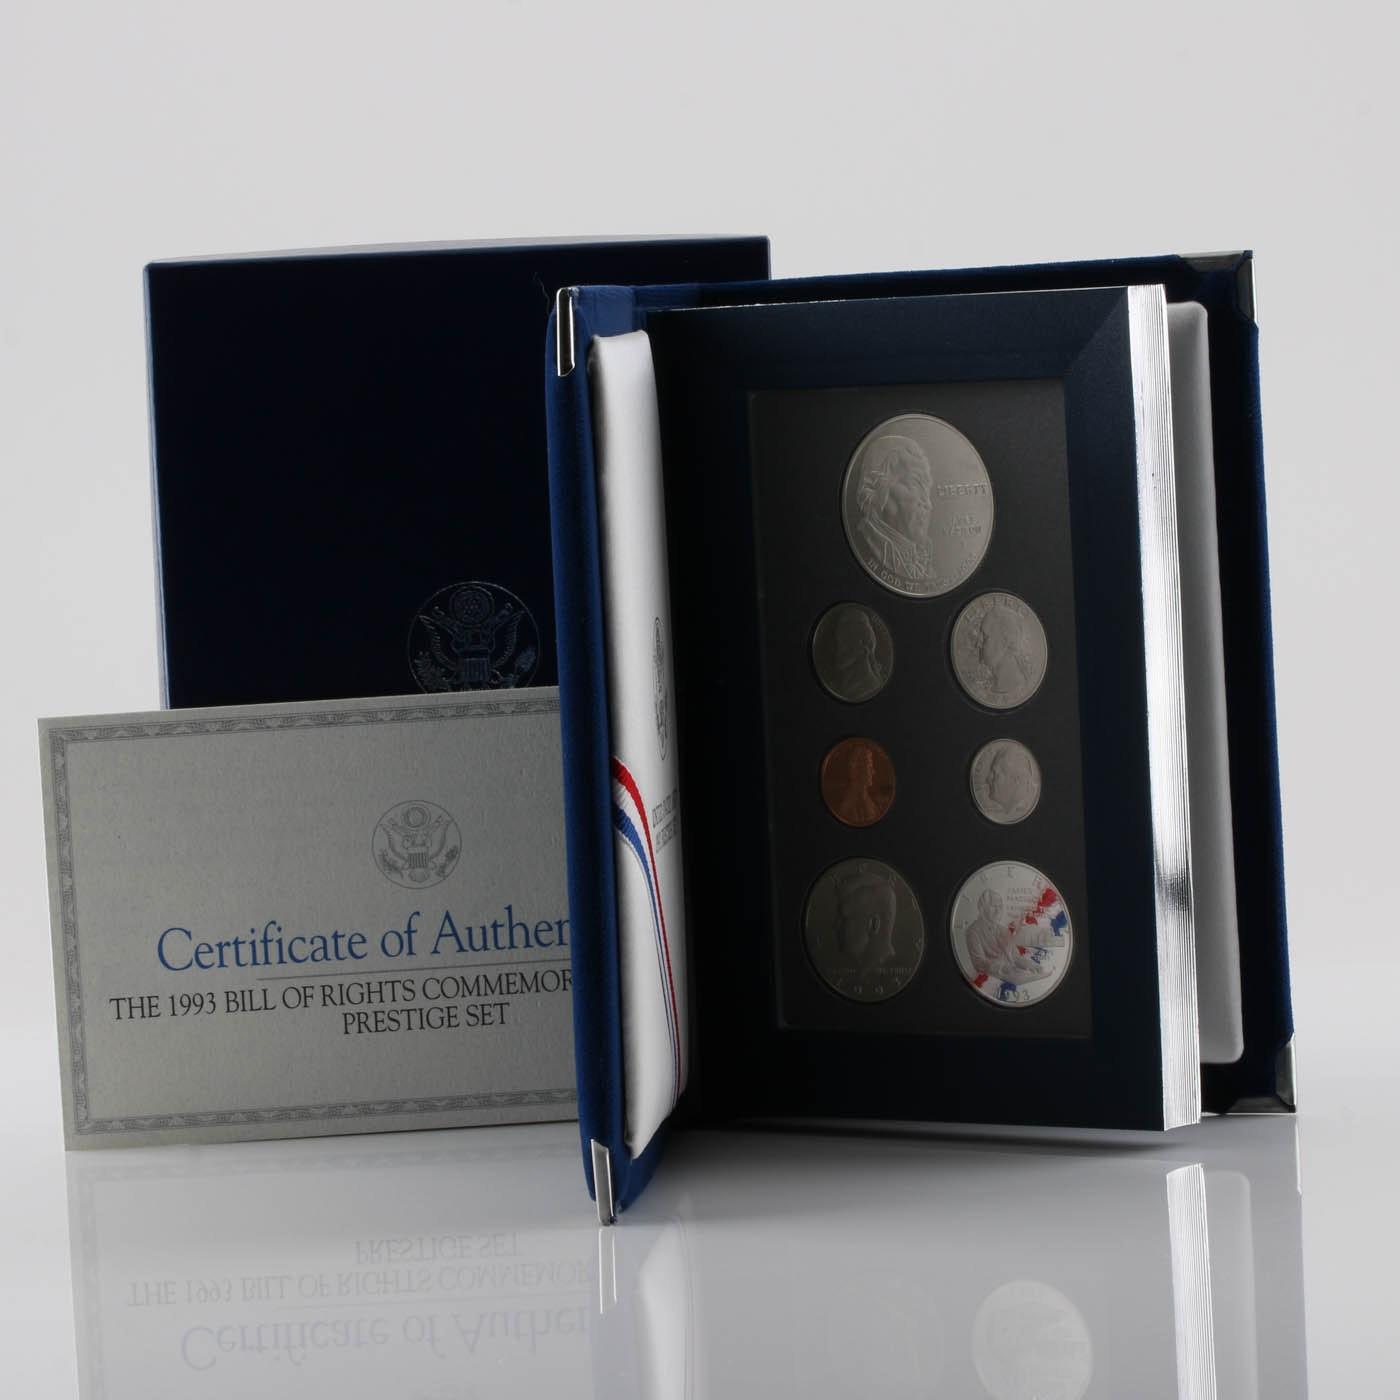 1993 United States Mint Prestige Set